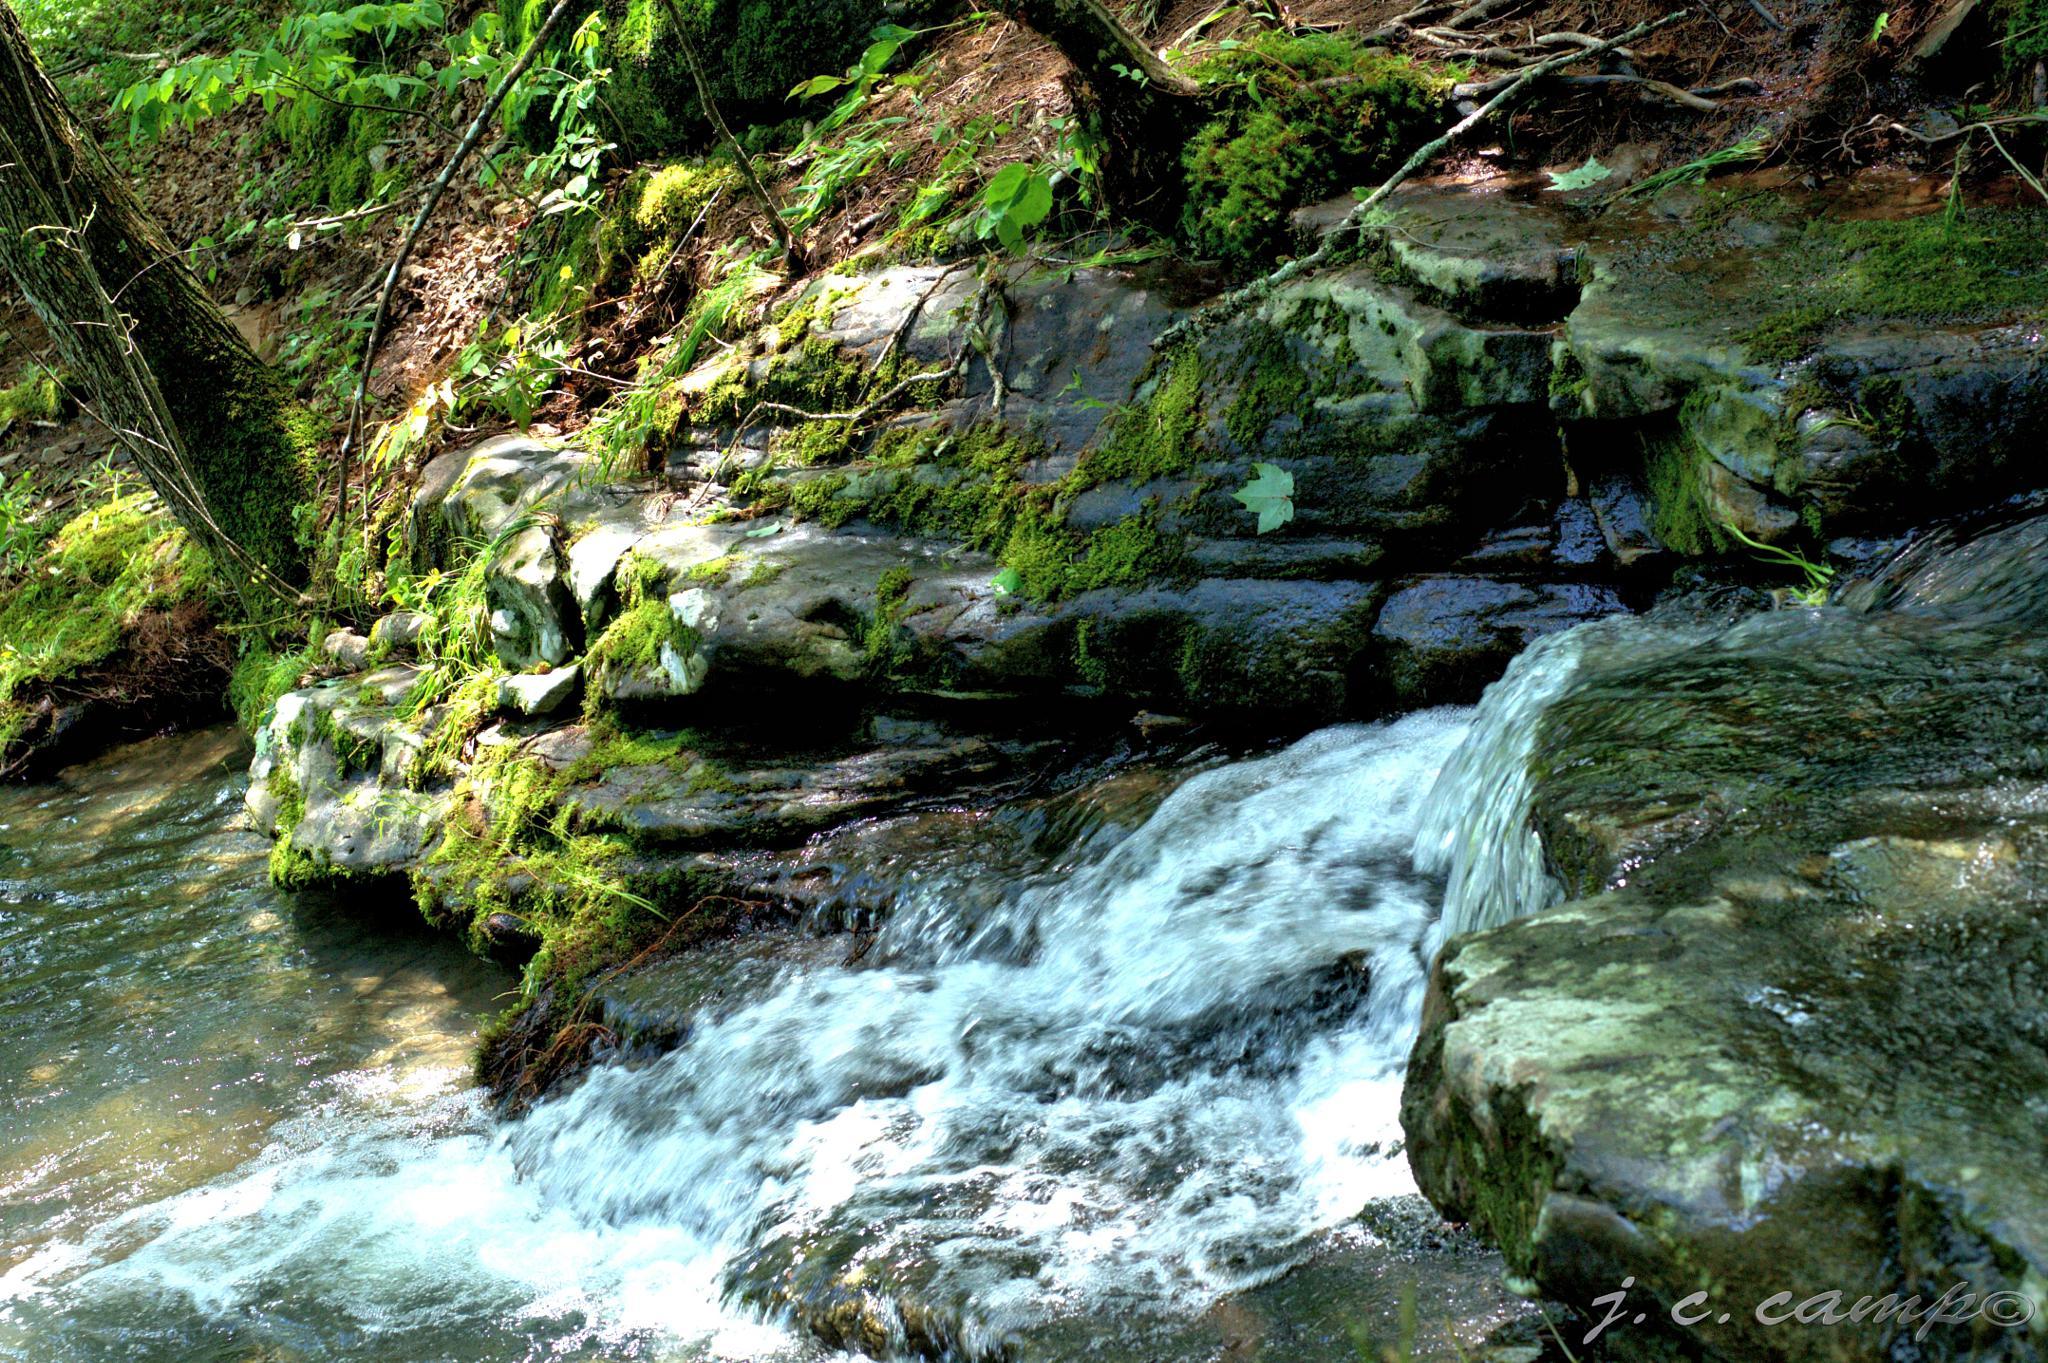 Cascade by Jim Camp